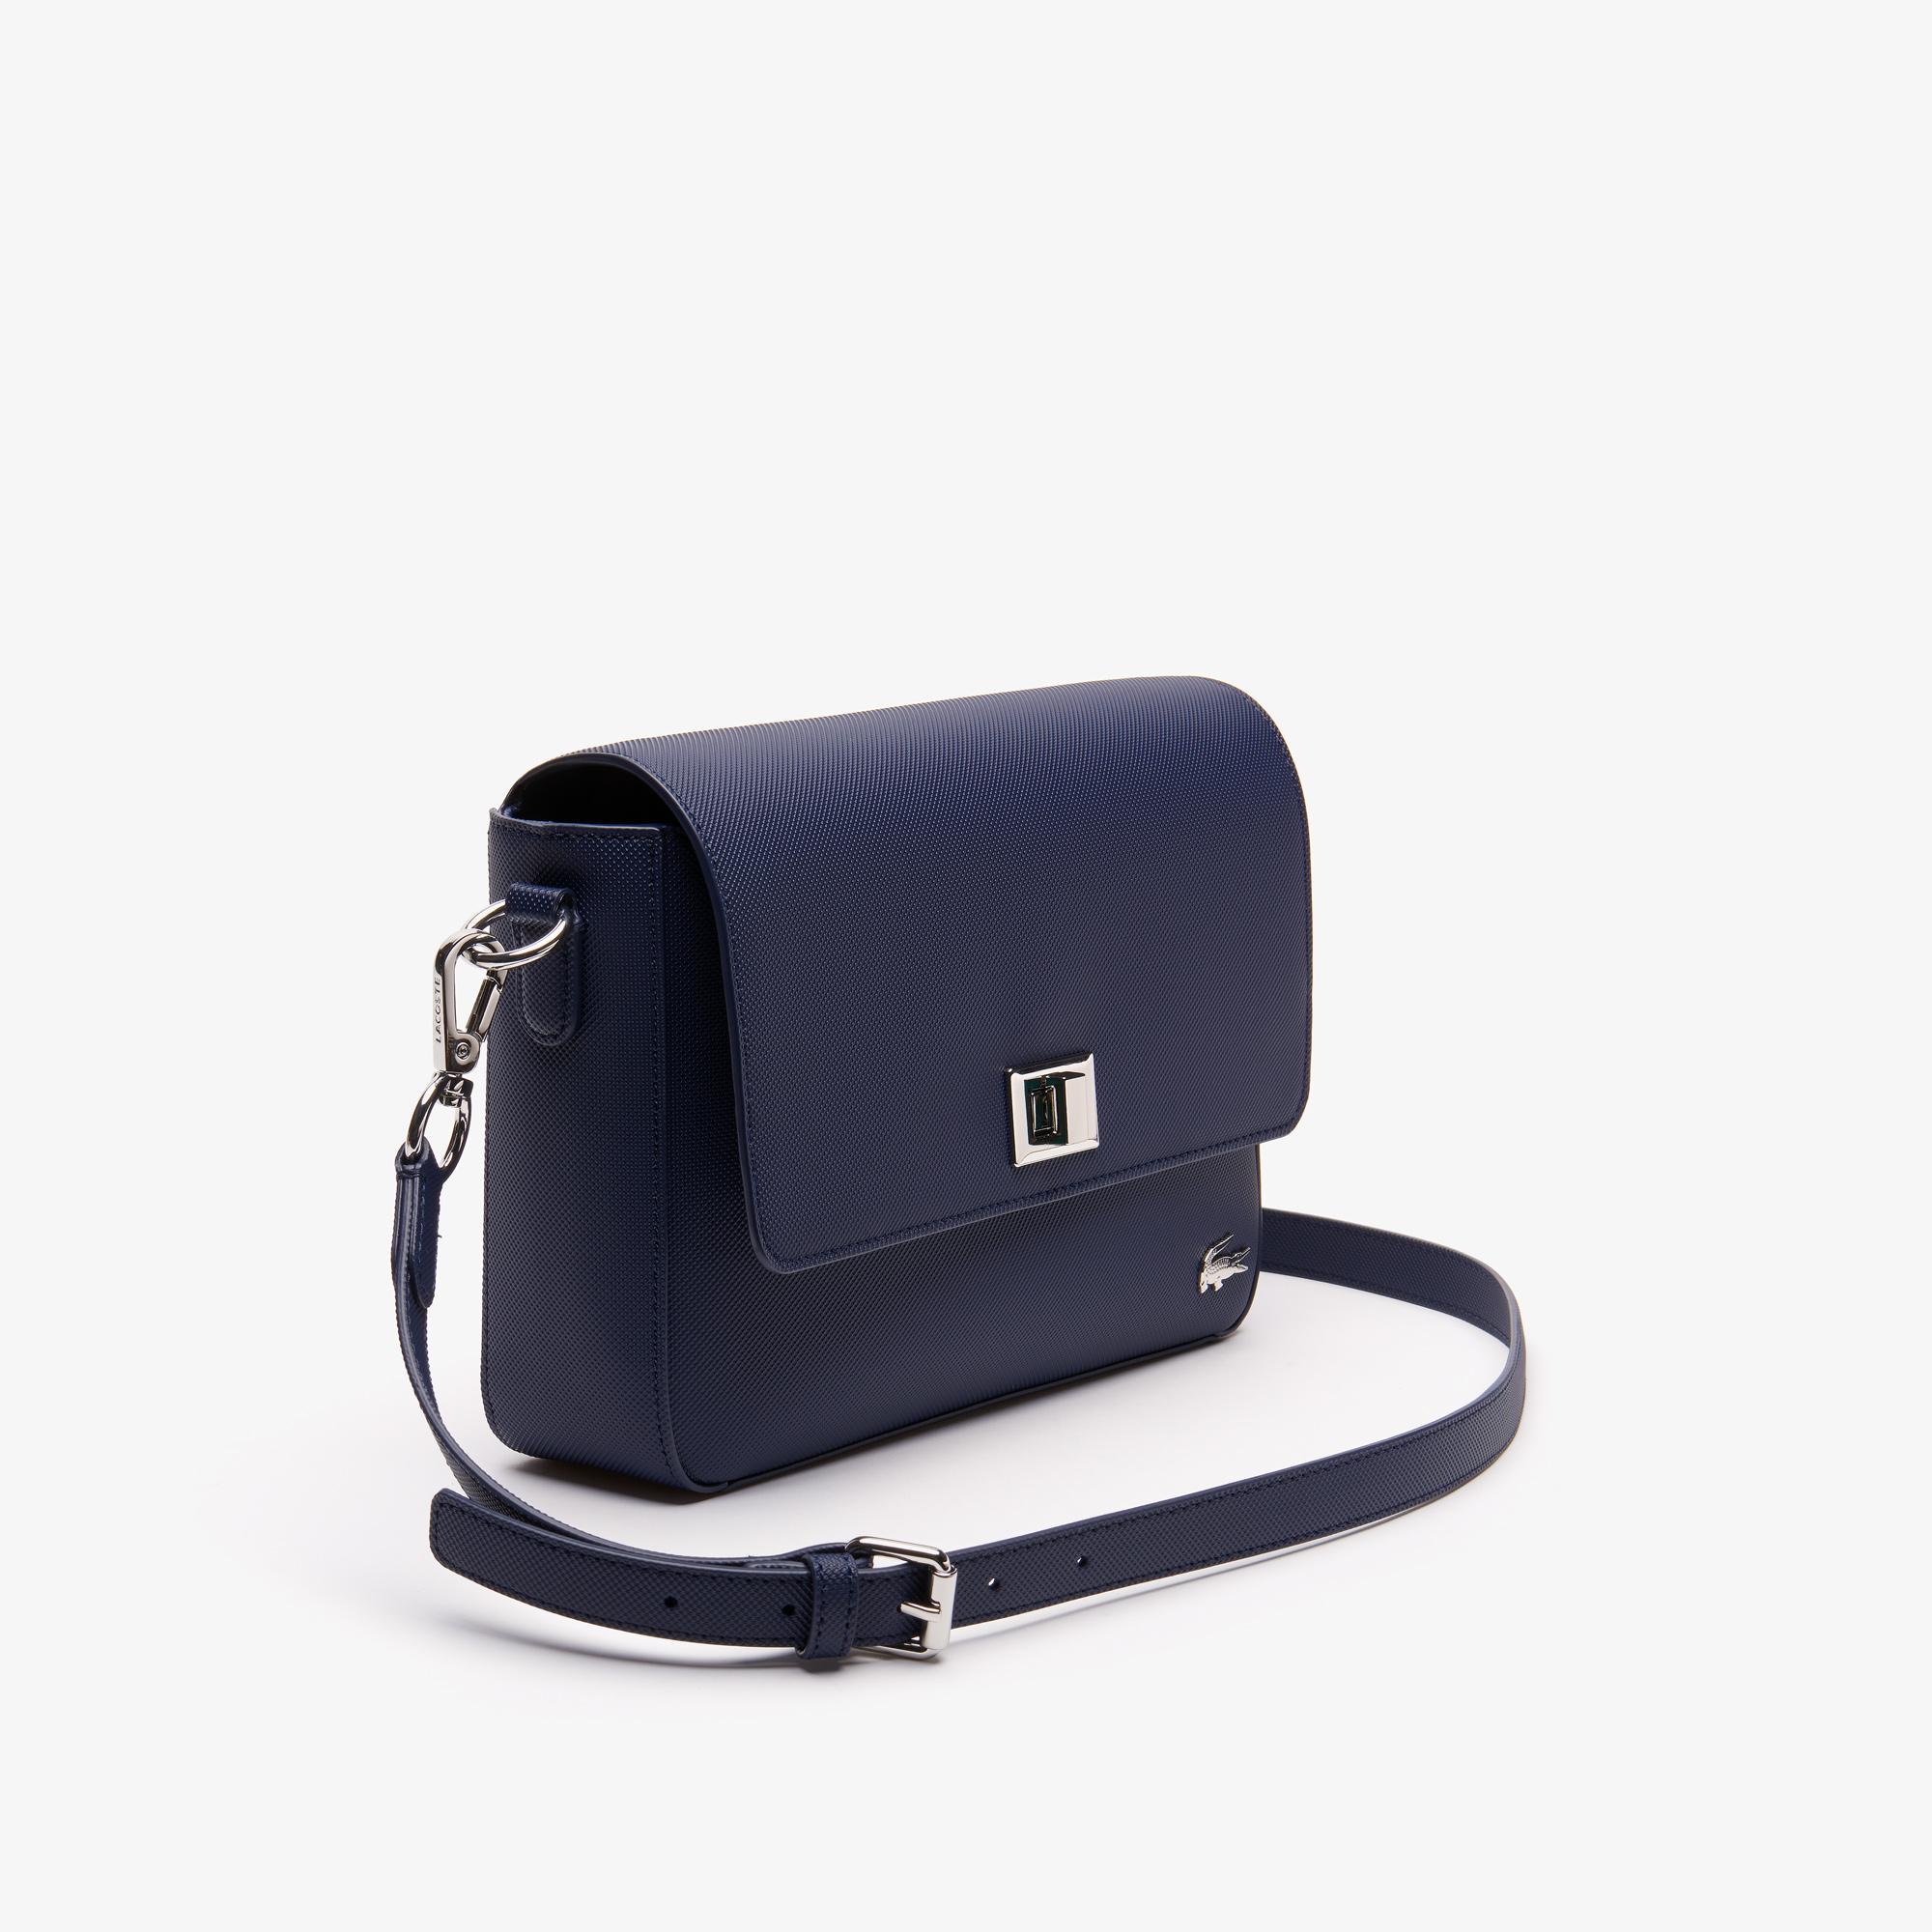 Lacoste Women's Daily Classic Coated Piqué Canvas Clasp Shoulder Bag